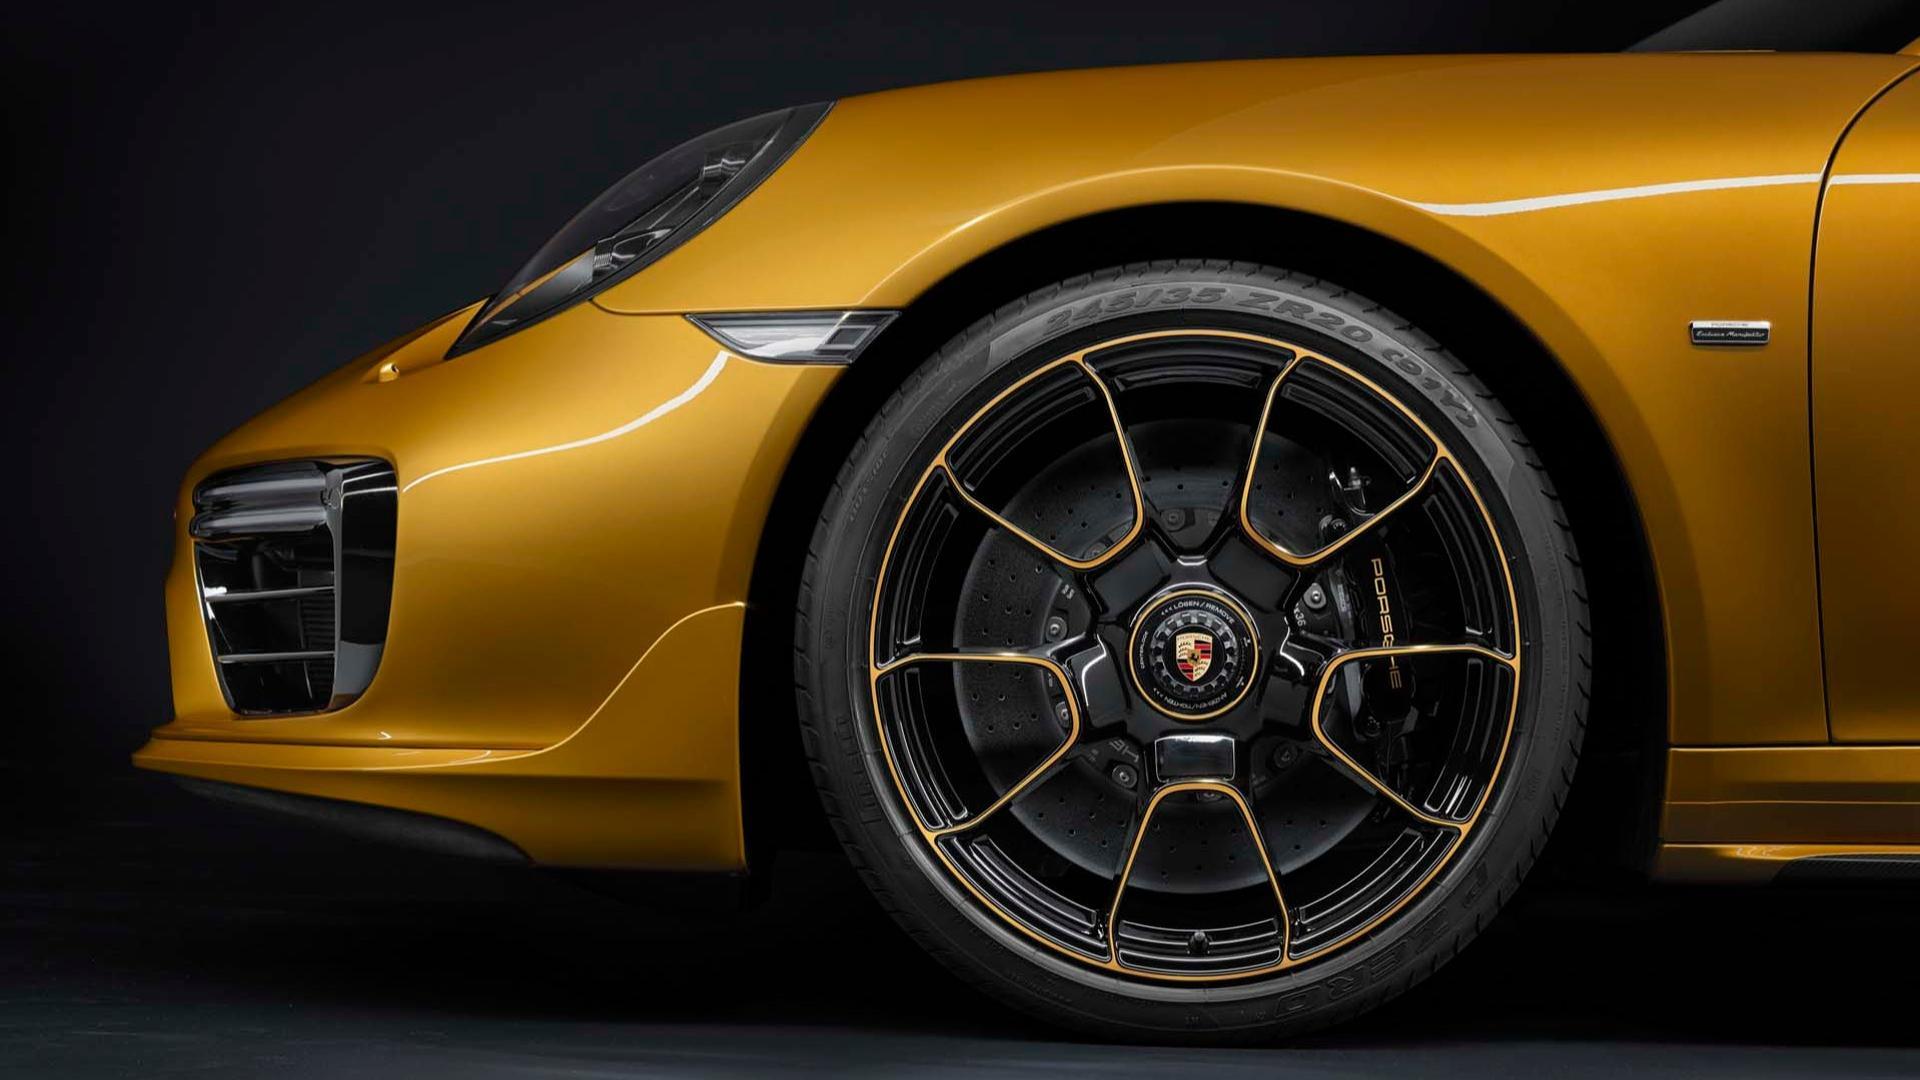 Porsche_911_Turbo_S_Exclusive_Series_15